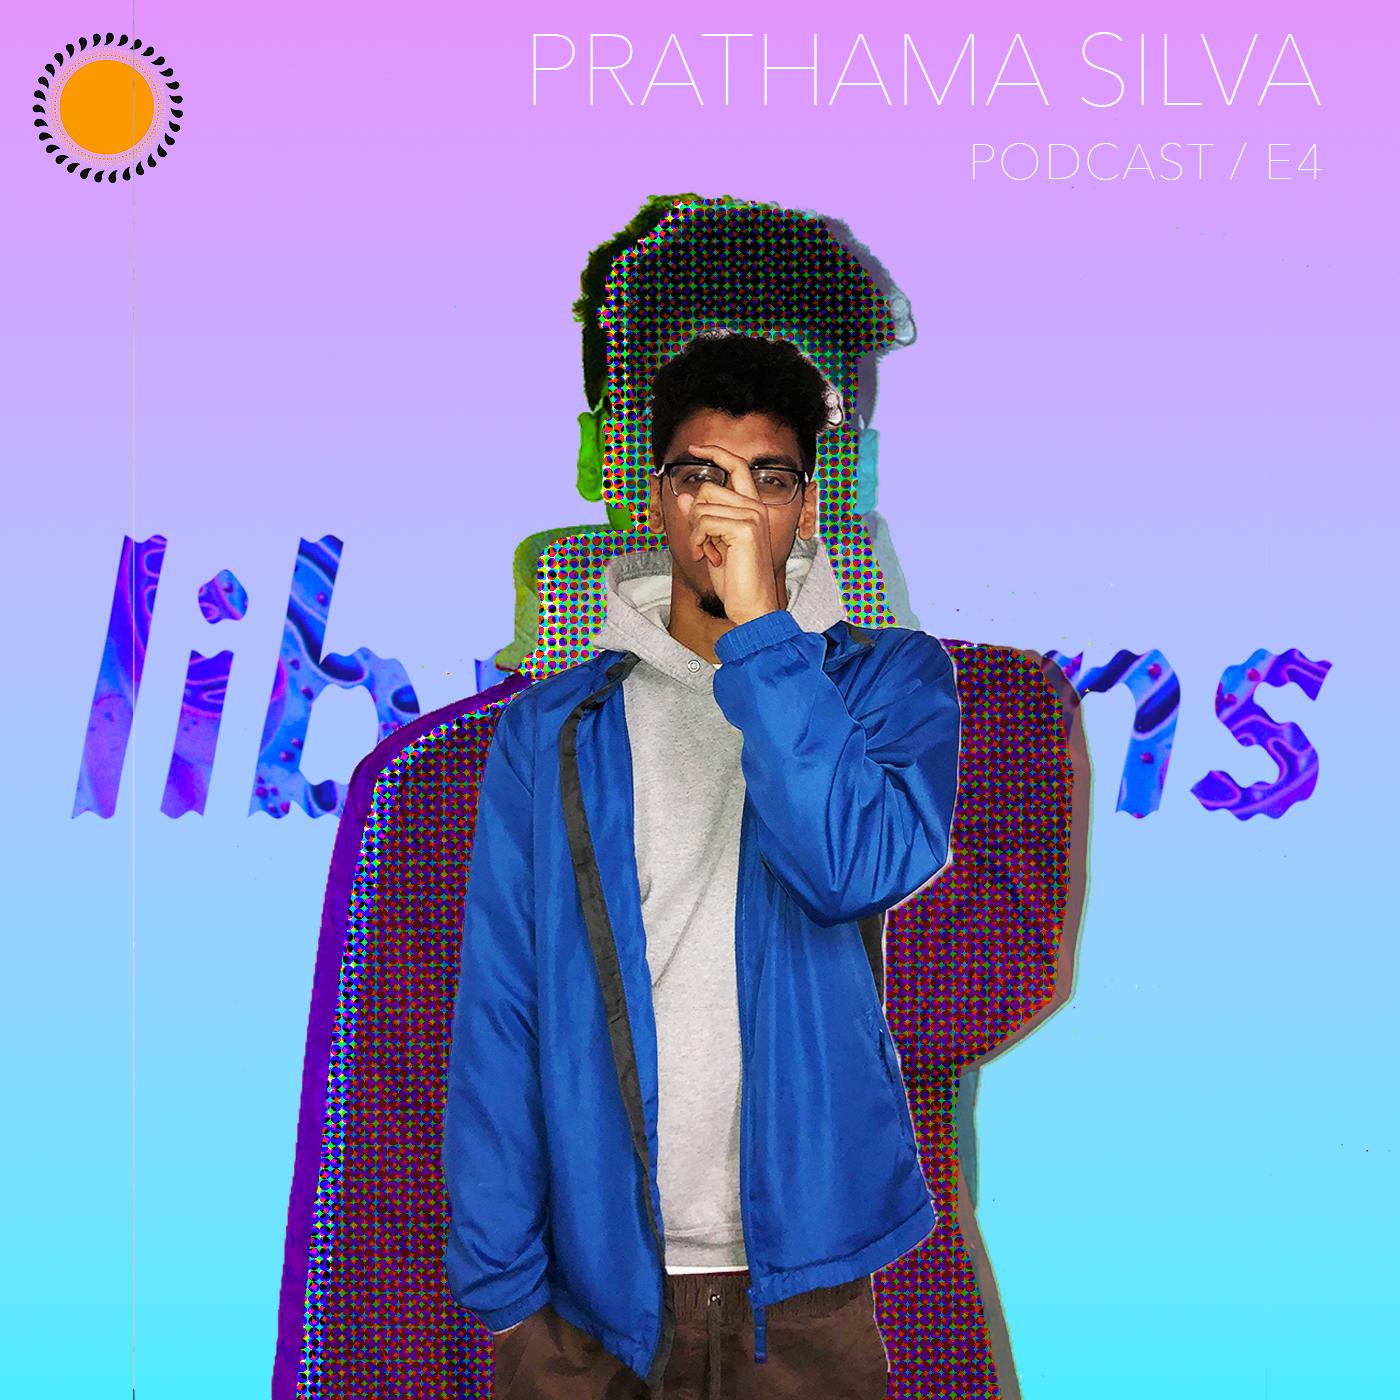 Libations-Podcast-E4-Prathama-Silva.png